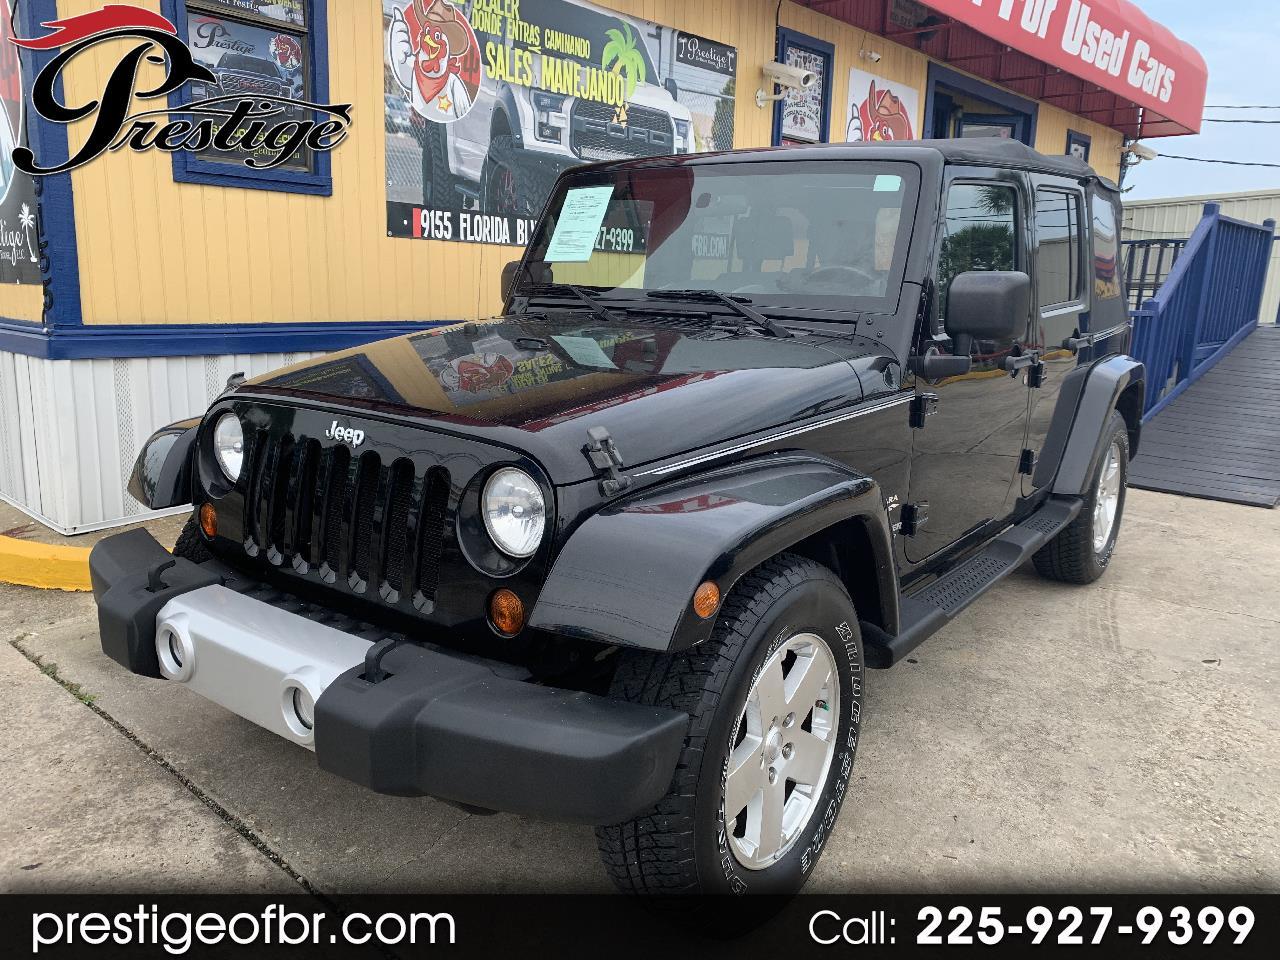 2010 Jeep Wrangler Unlimited Sahara 2WD